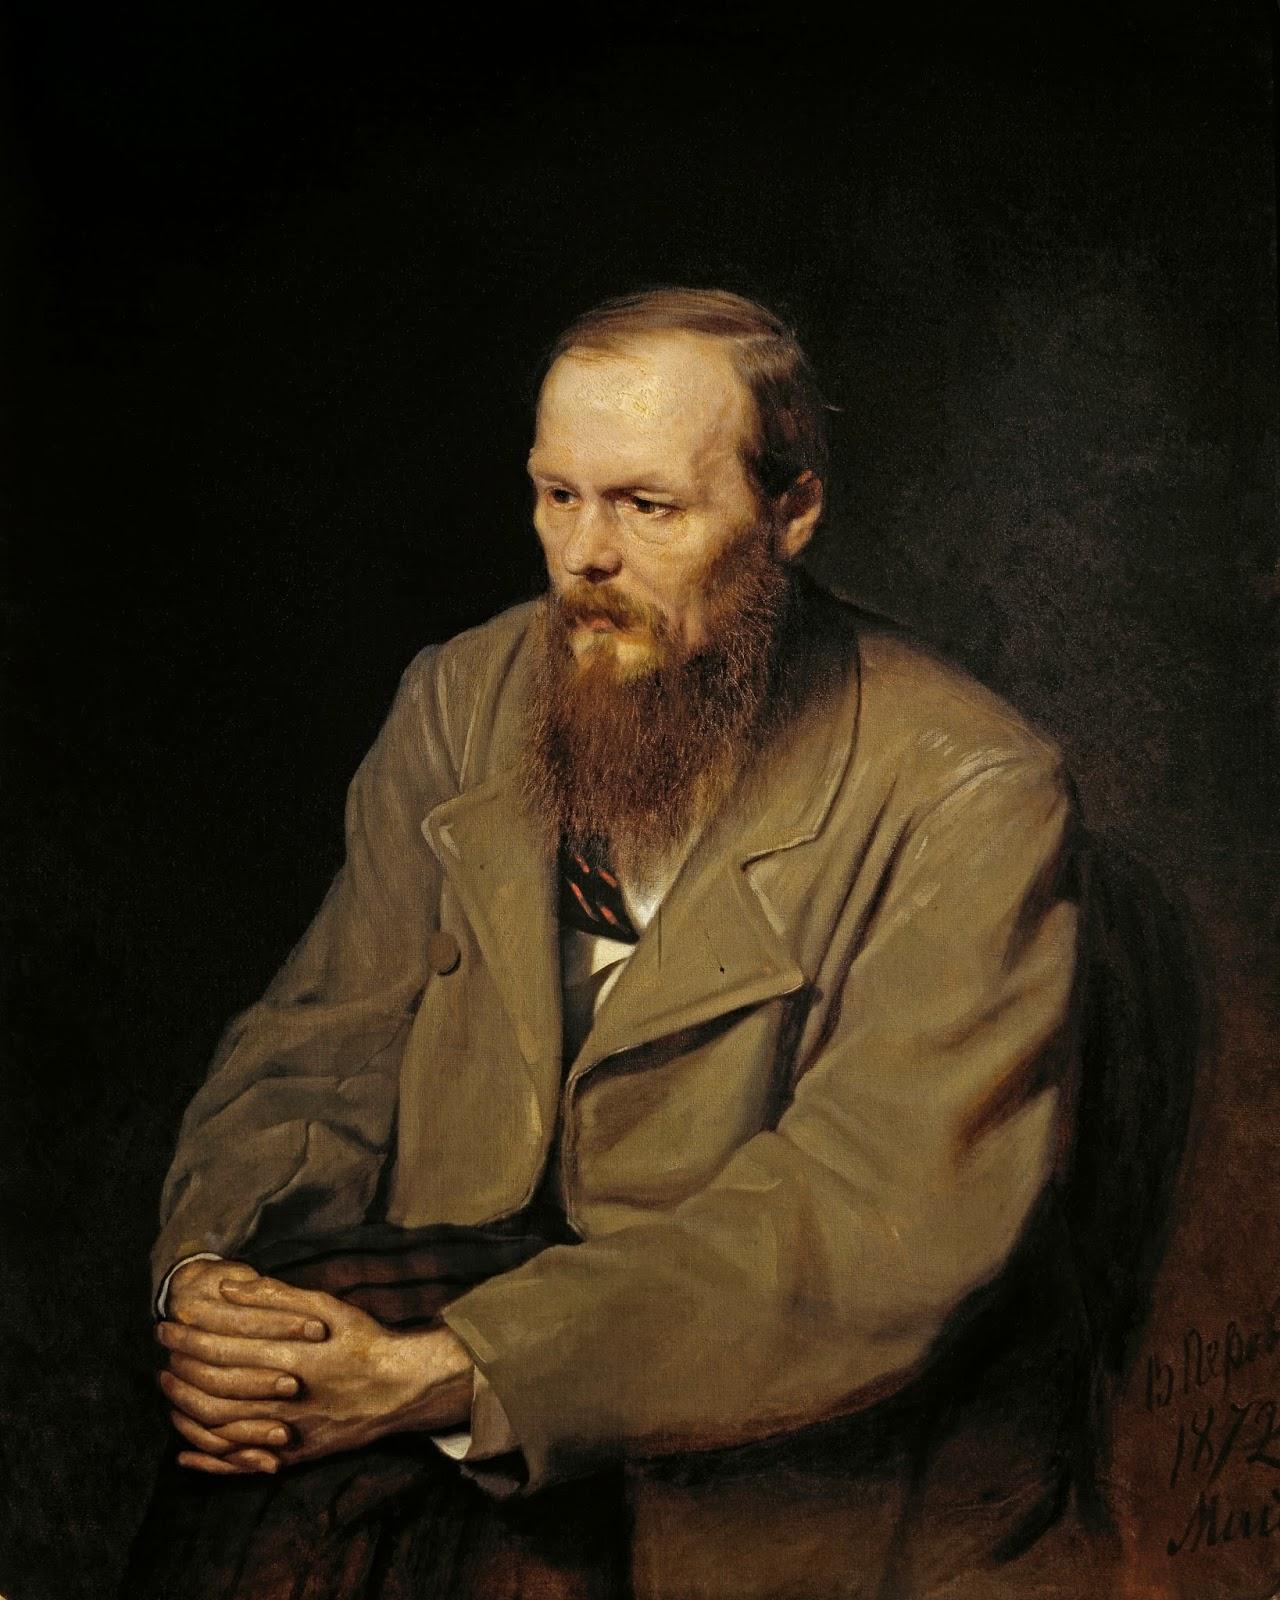 45 Psychological, Social, Political & Spiritual Quotes By Fyodor Dostoyevsky